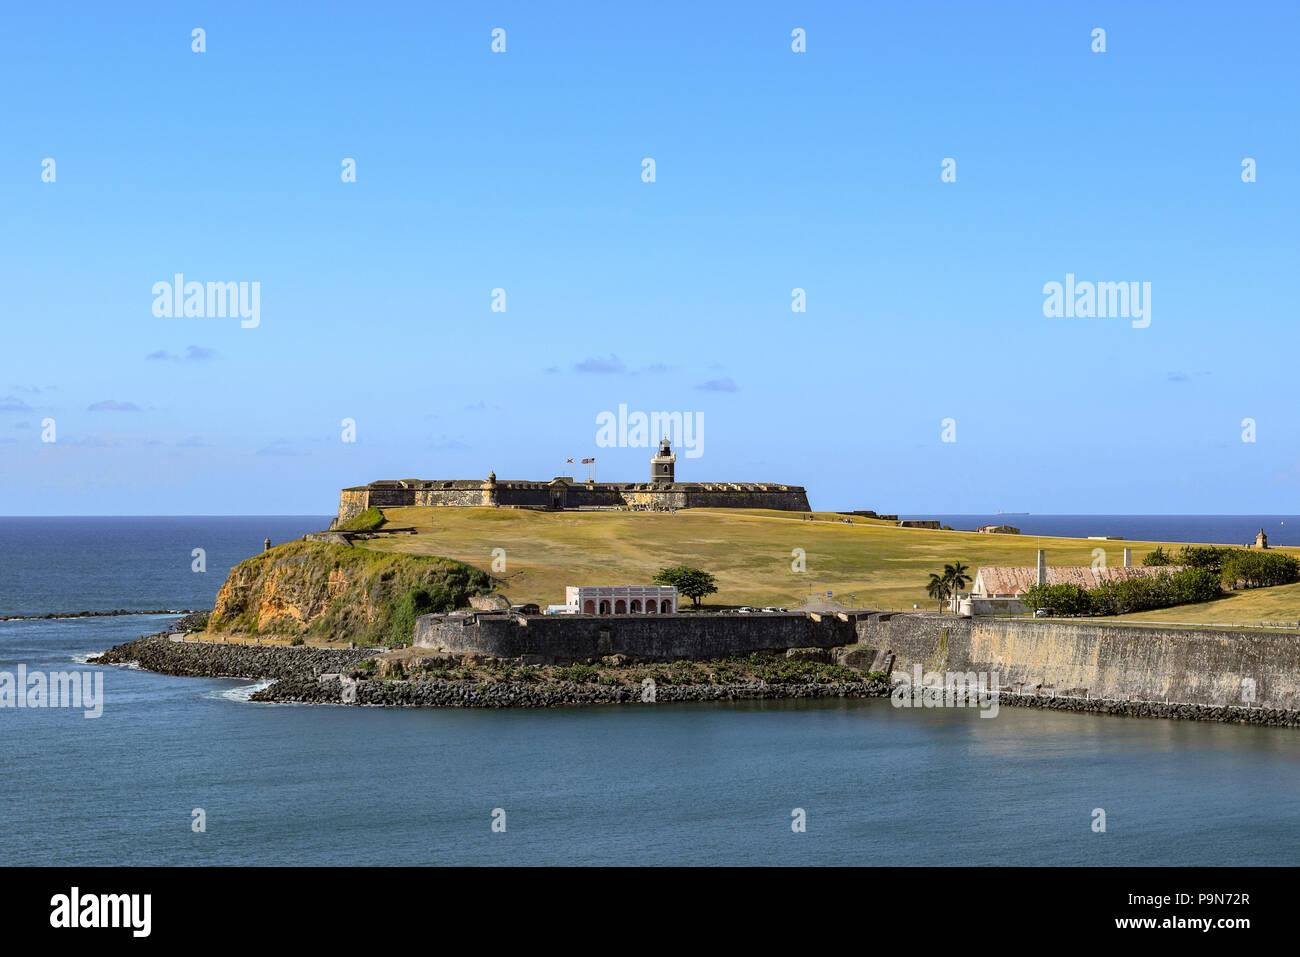 San Juan, Puerto Rico - April 02 2014: View from the ocean of the historic Castillo San Felipe del Morro on the coastline of Old San Juan. - Stock Image